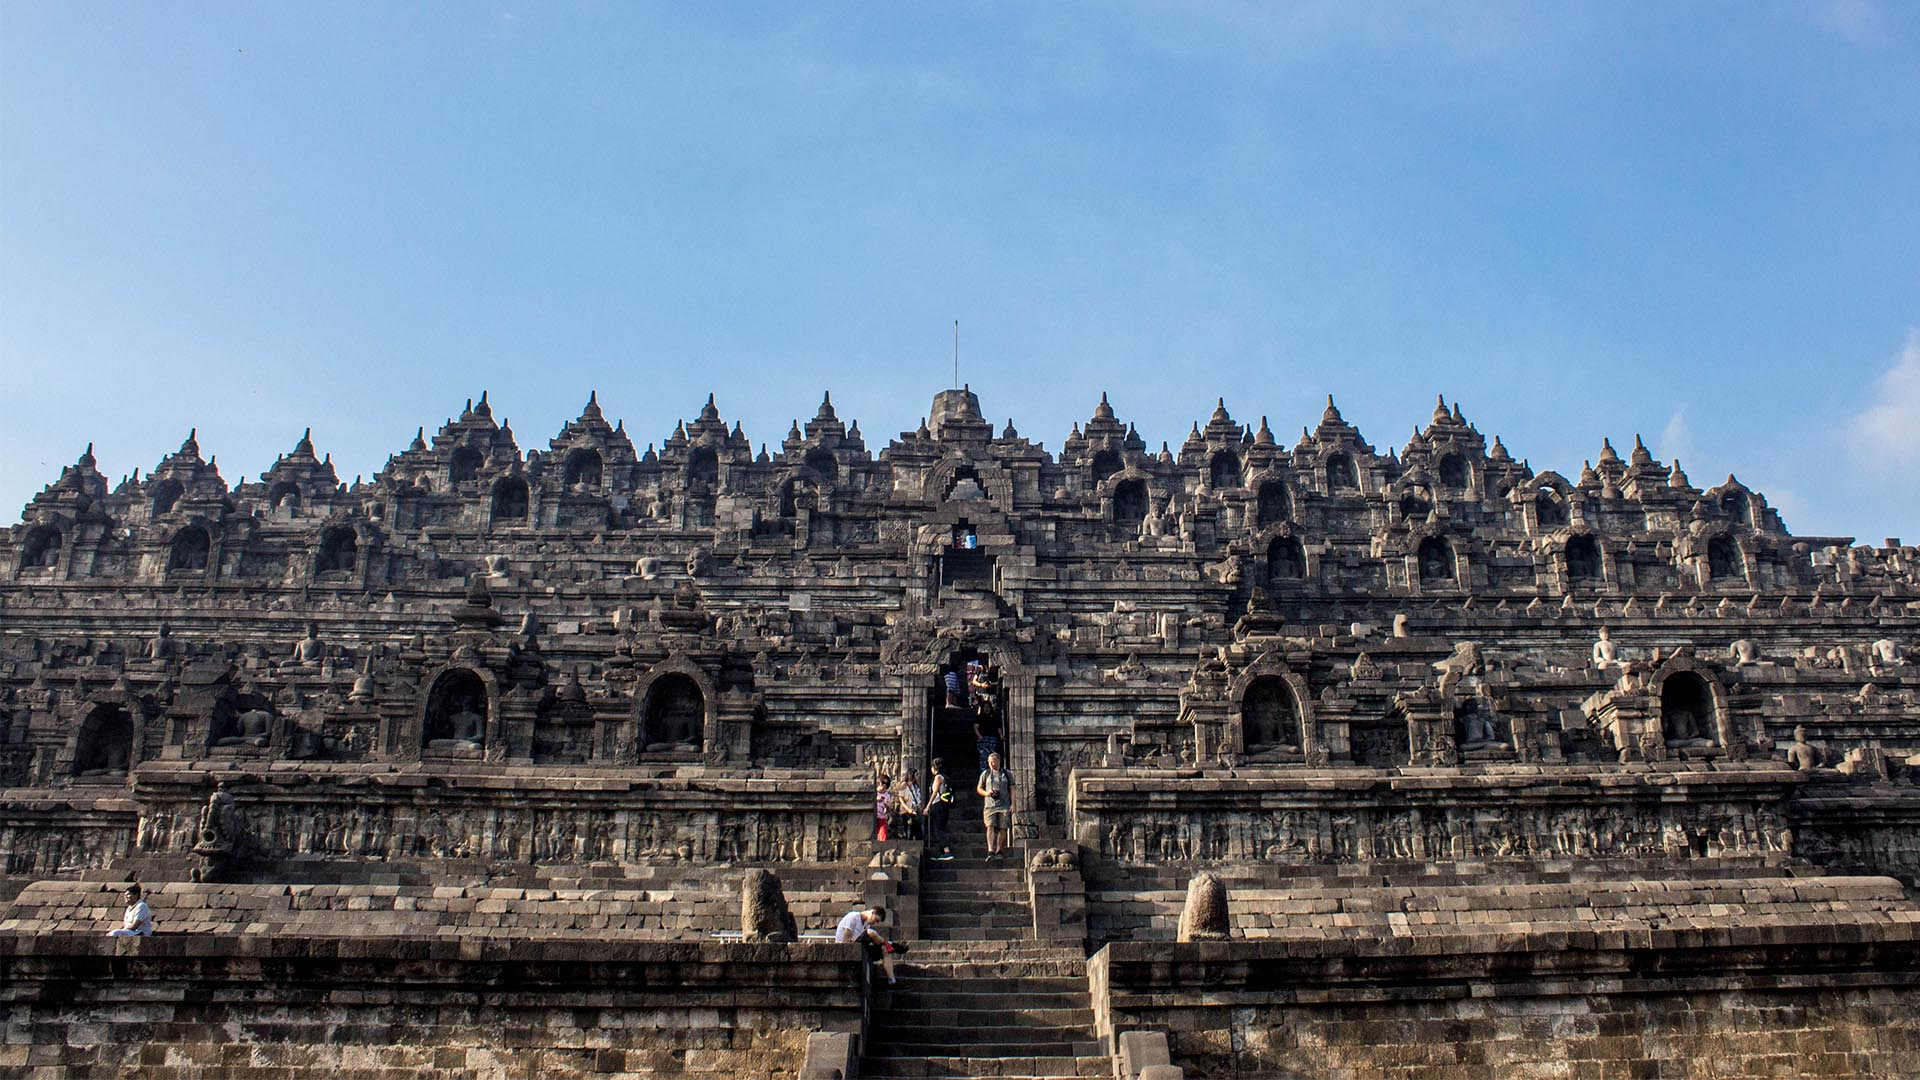 Entrada al Templo Borobudur